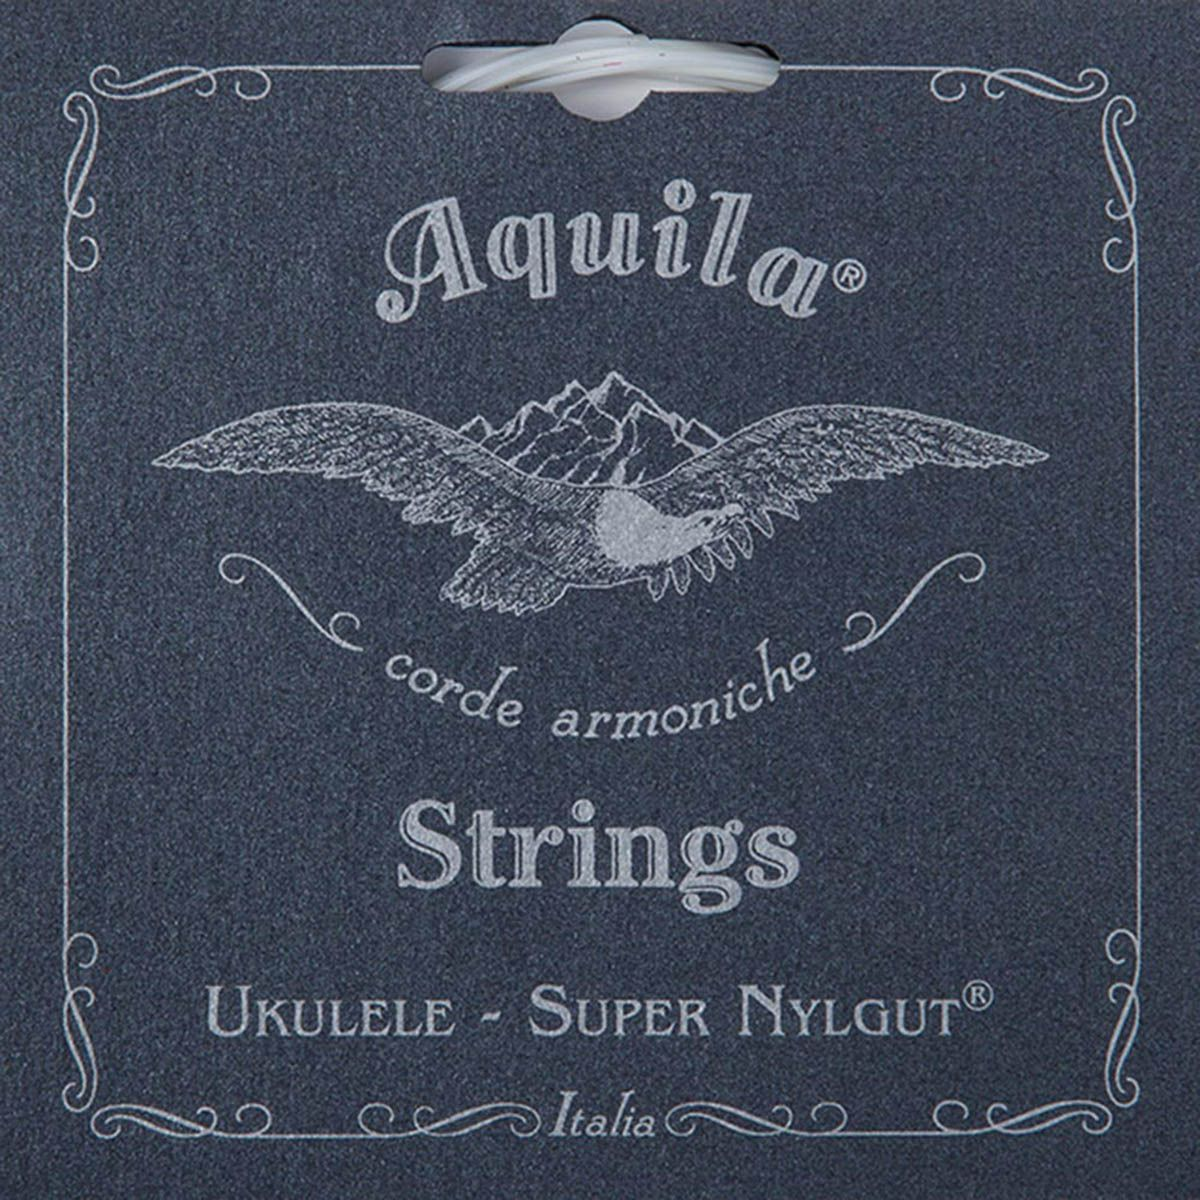 Encordoamento Aquila 106u Super Nylgut High G Ukulele Tenor